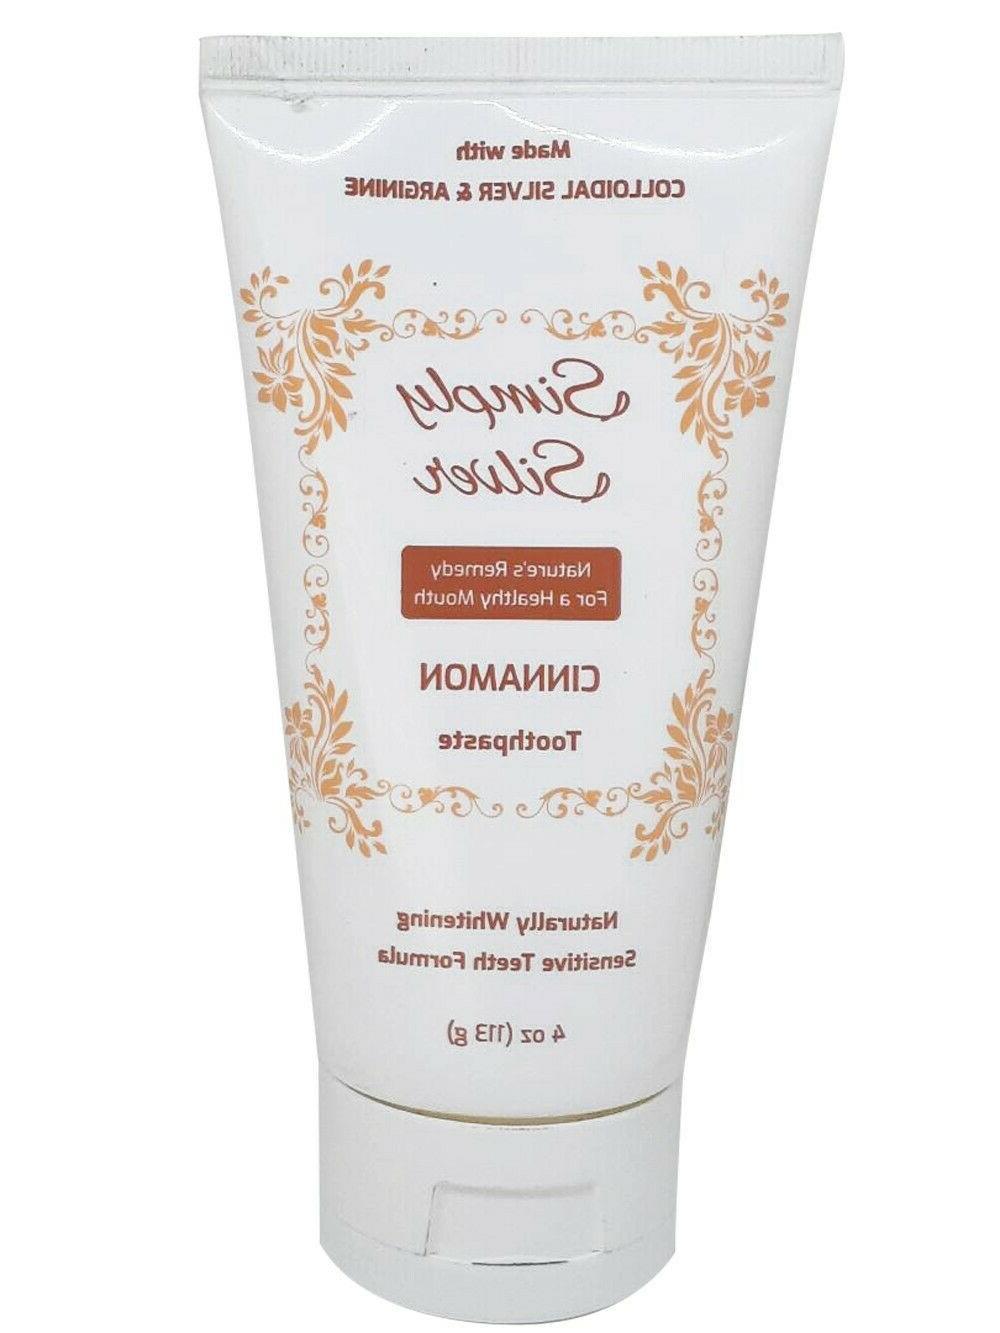 cinnamon toothpaste 4 oz naturally whitening sensitive